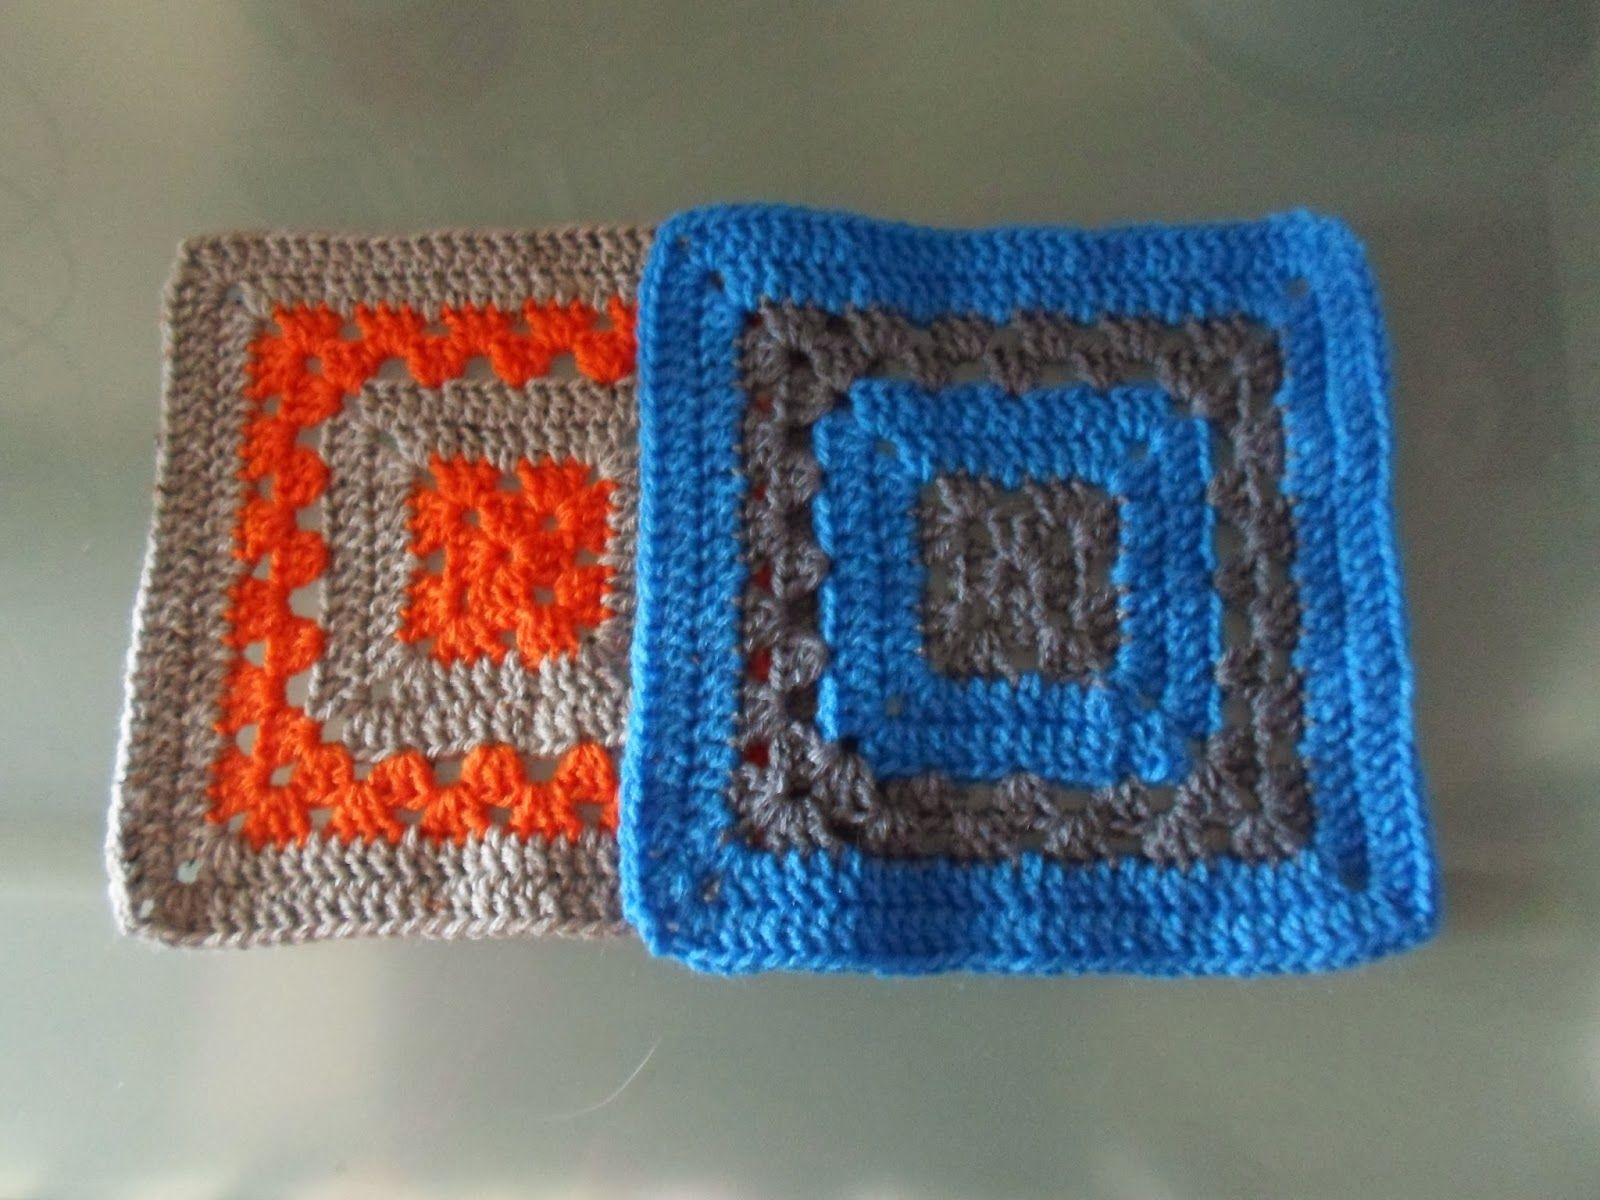 The Anarchist Knitter: Granny, Meet the Stripes - Free Crochet ...